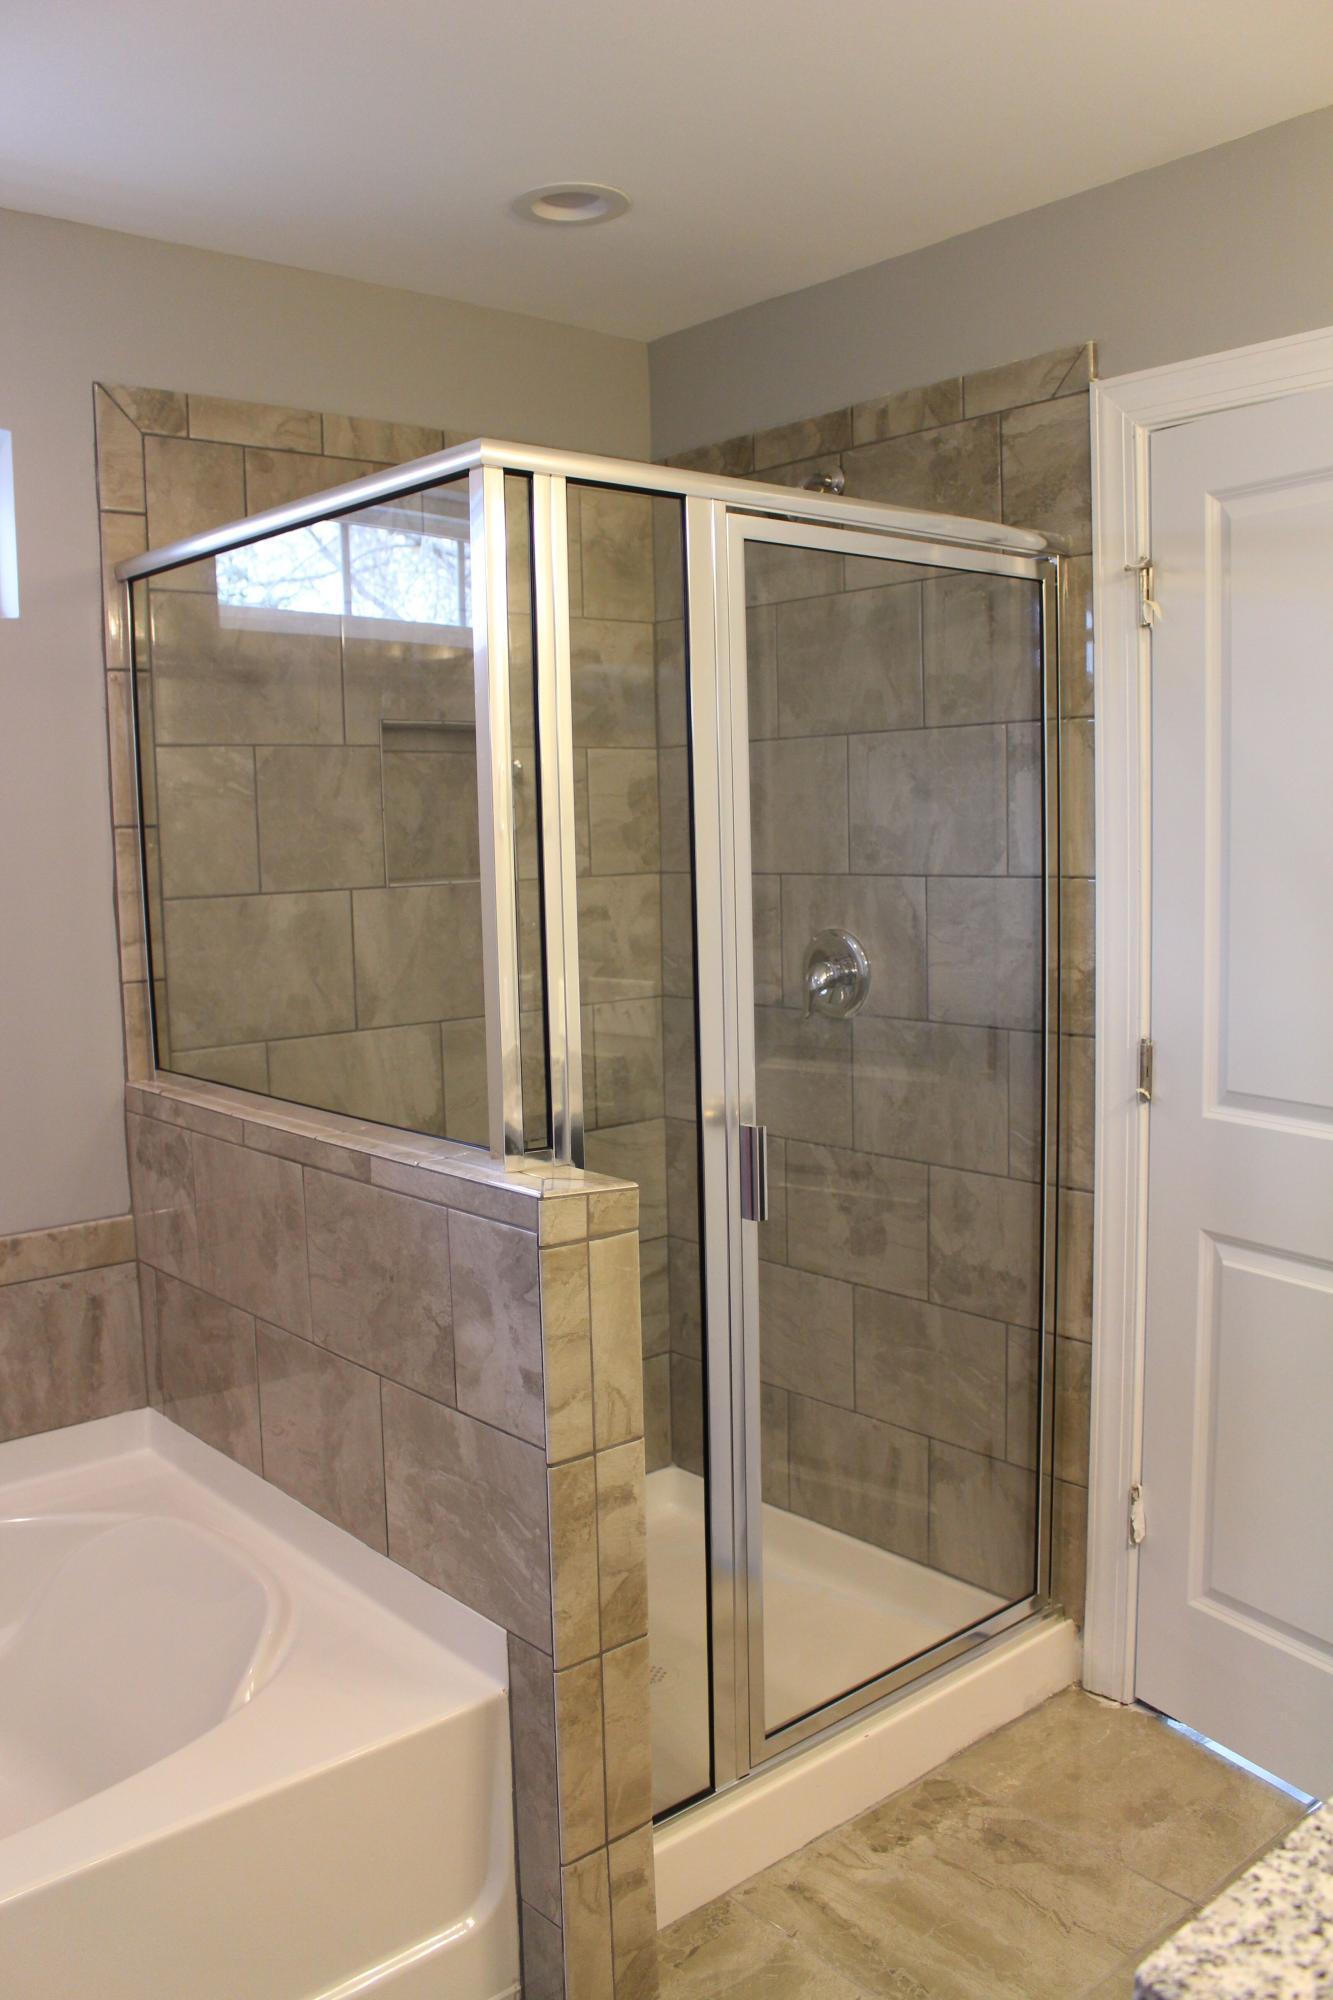 Filbin Creek Homes For Sale - 1173 Sumner, North Charleston, SC - 0